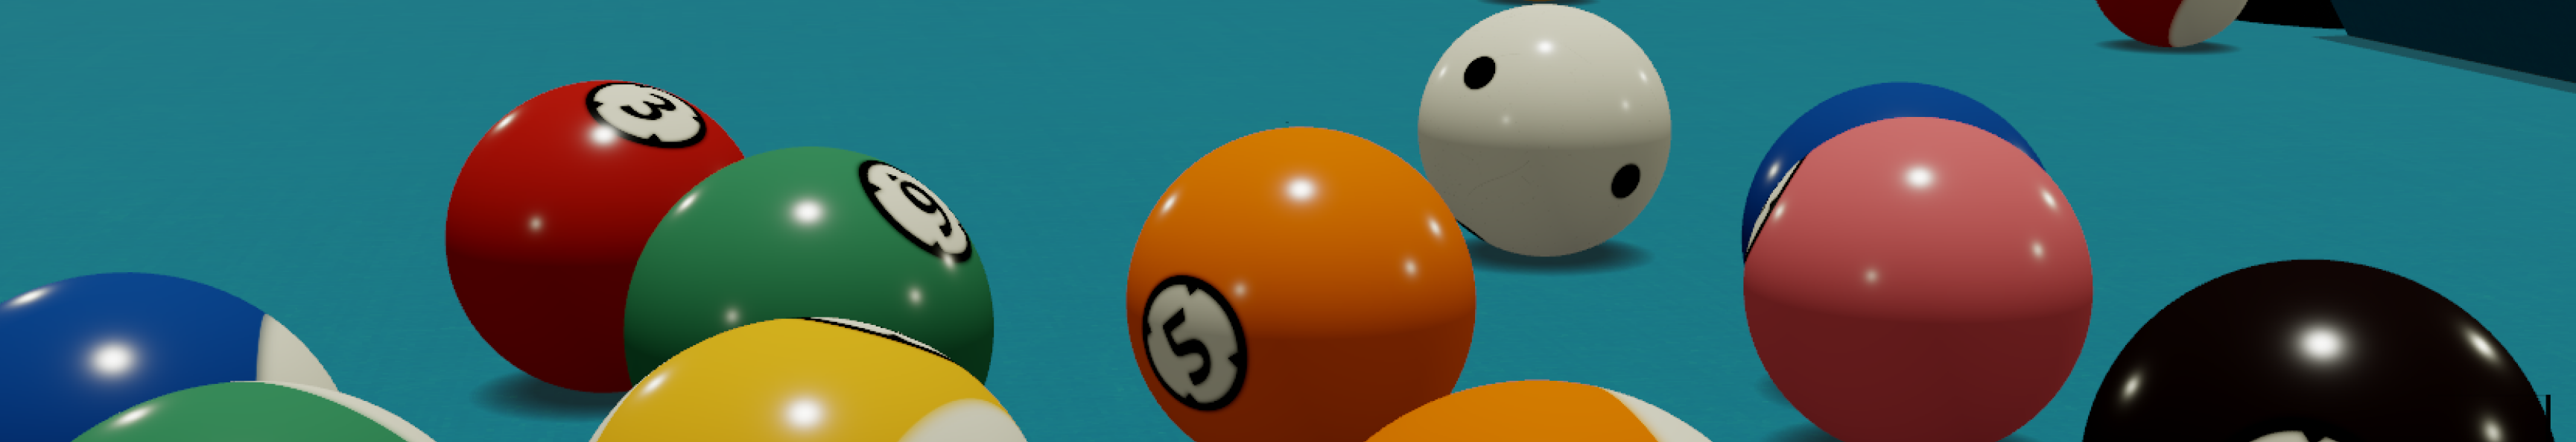 Billiards simulator III: Implementing the event-based shot evolution algorithm feature image